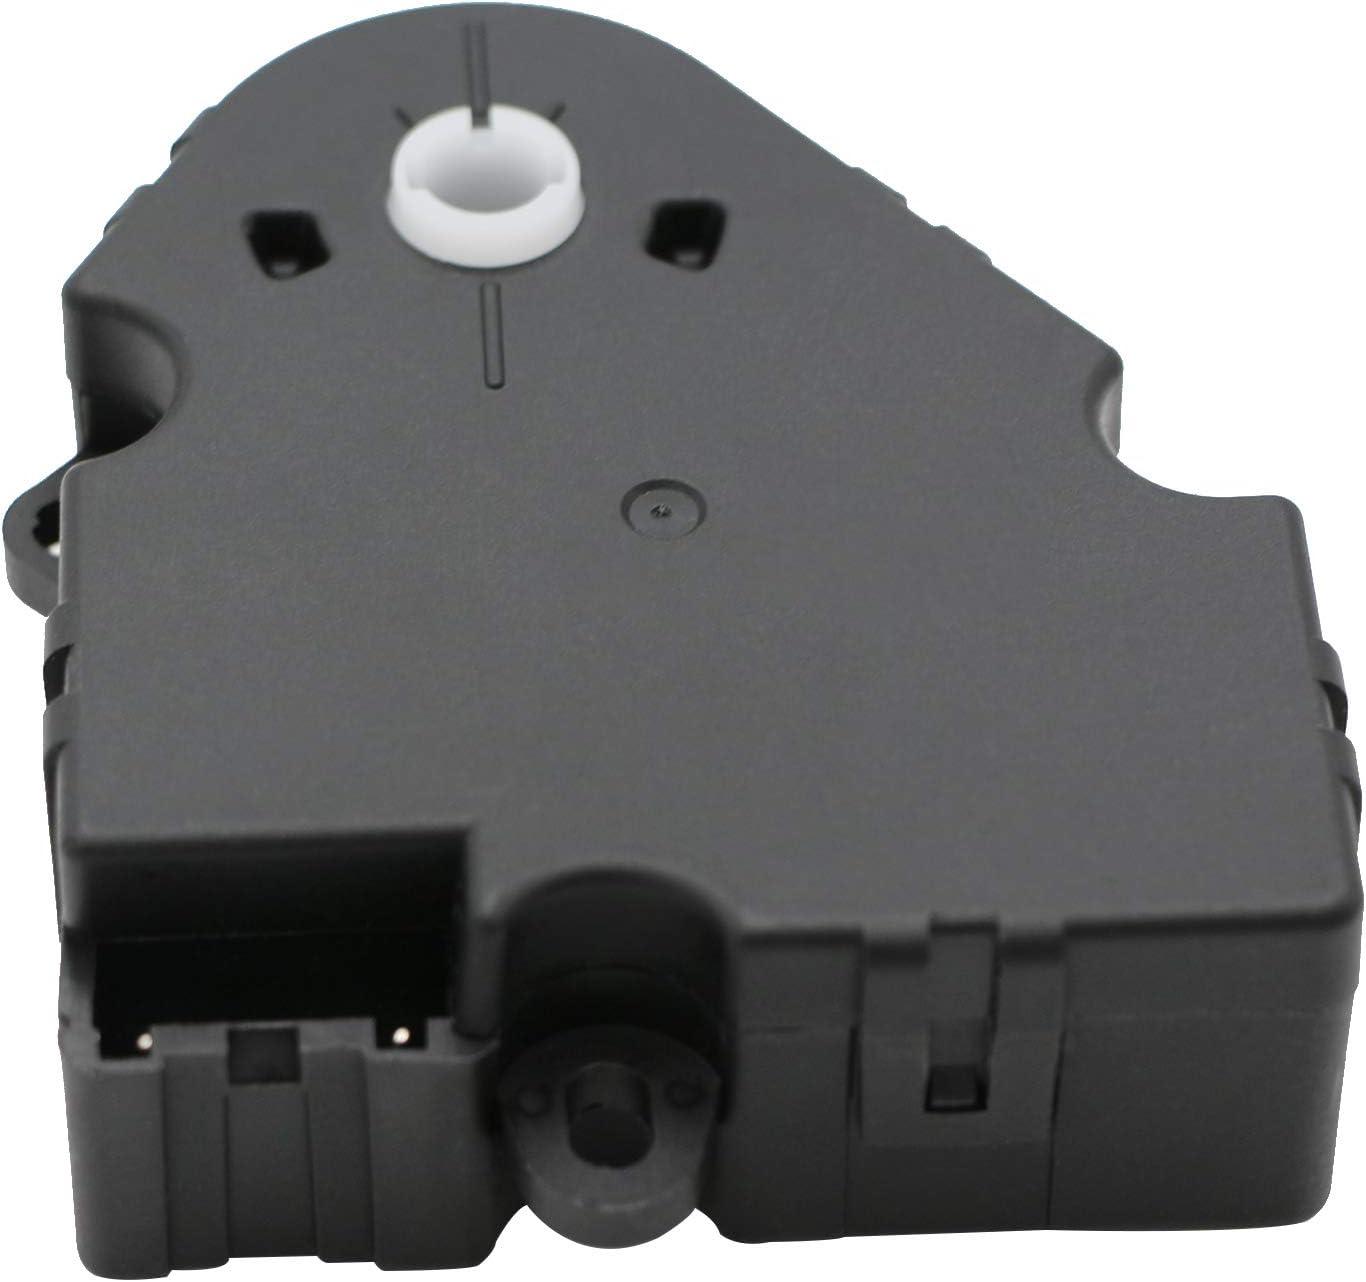 Fits Chevy Silverado 1500 Silverado 2500 HD Tahoe 52402588 GMC Sierra 1500 99 00 01 02 03 04 05 06 07 08 09 10 11 12 13 Blend Door Actuator Replaces# 89018365 HVAC Blend Control Act 604-106